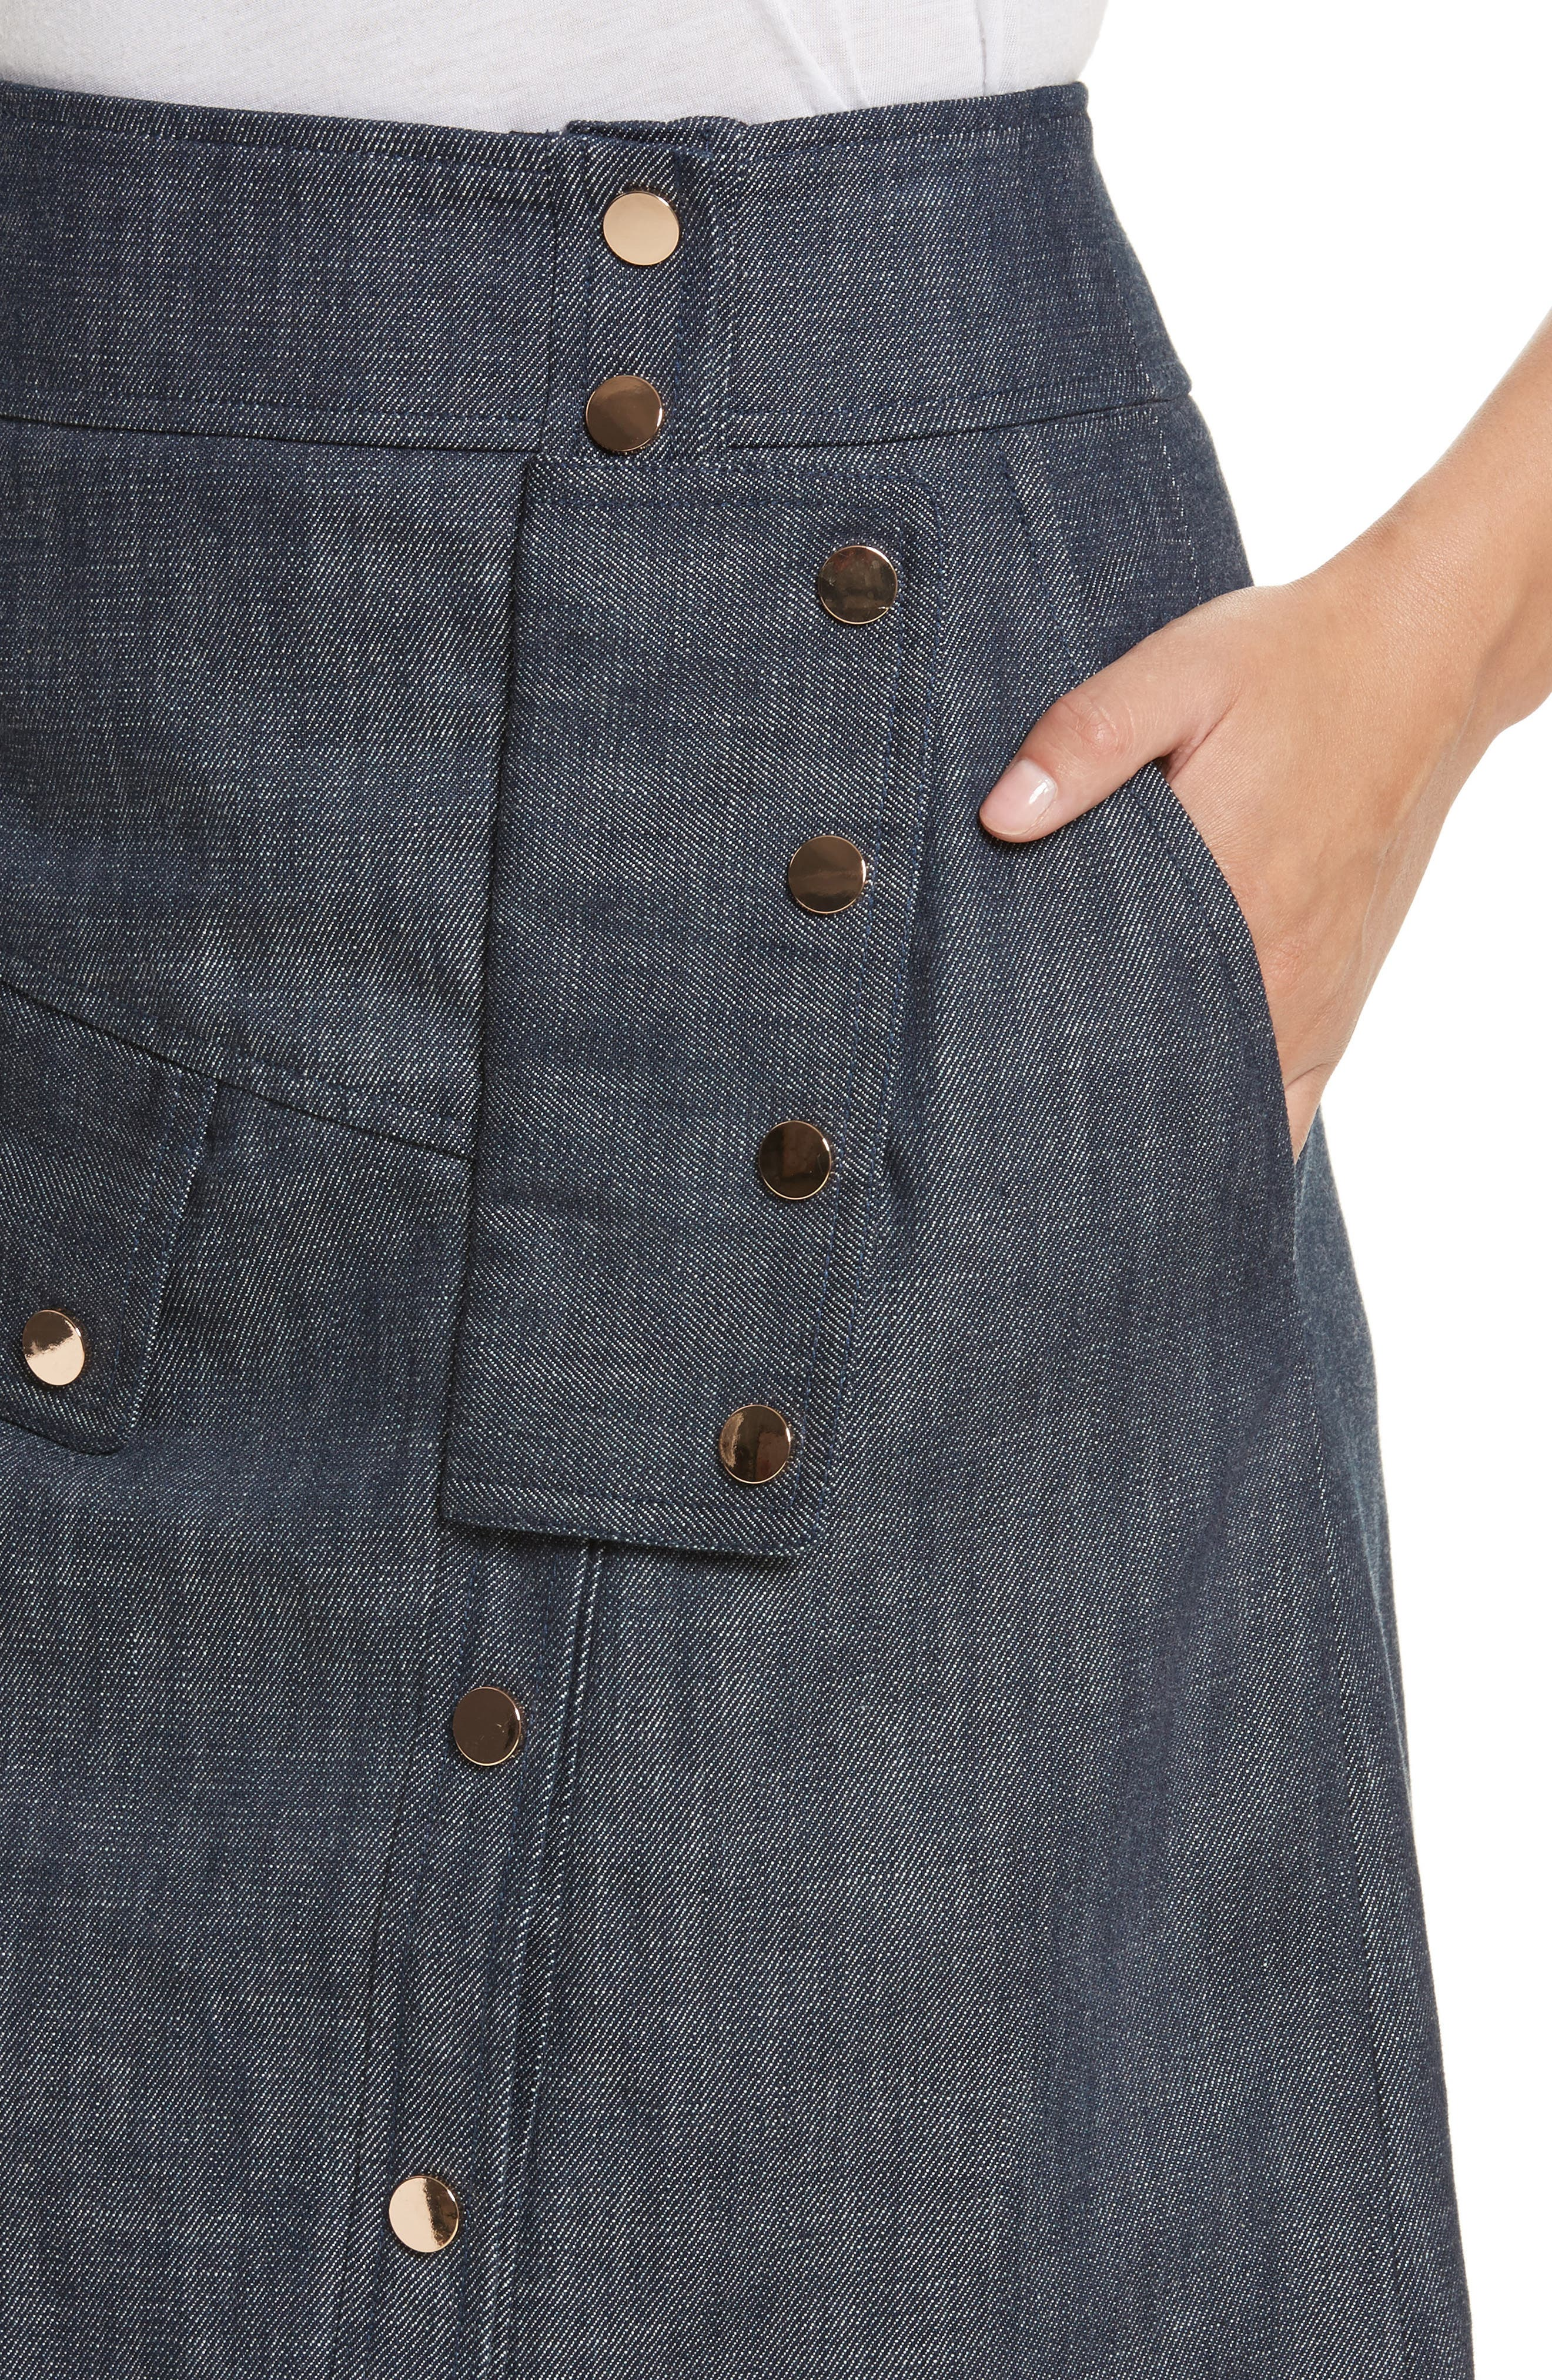 Snap Front Raw Denim Skirt,                             Alternate thumbnail 4, color,                             400